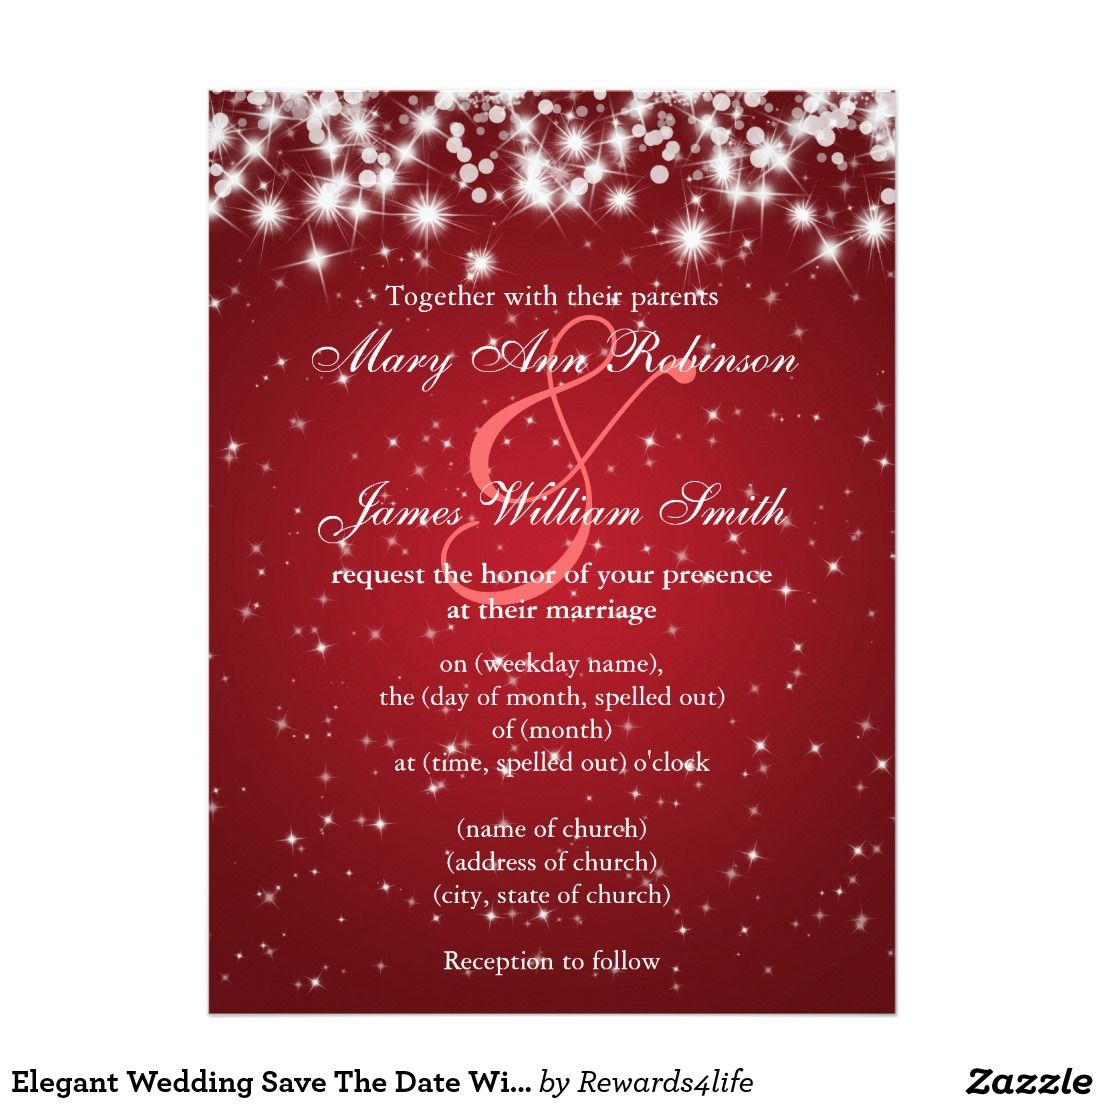 Elegant Wedding Save The Date Winter Sparkle Red Card | Elegant ...